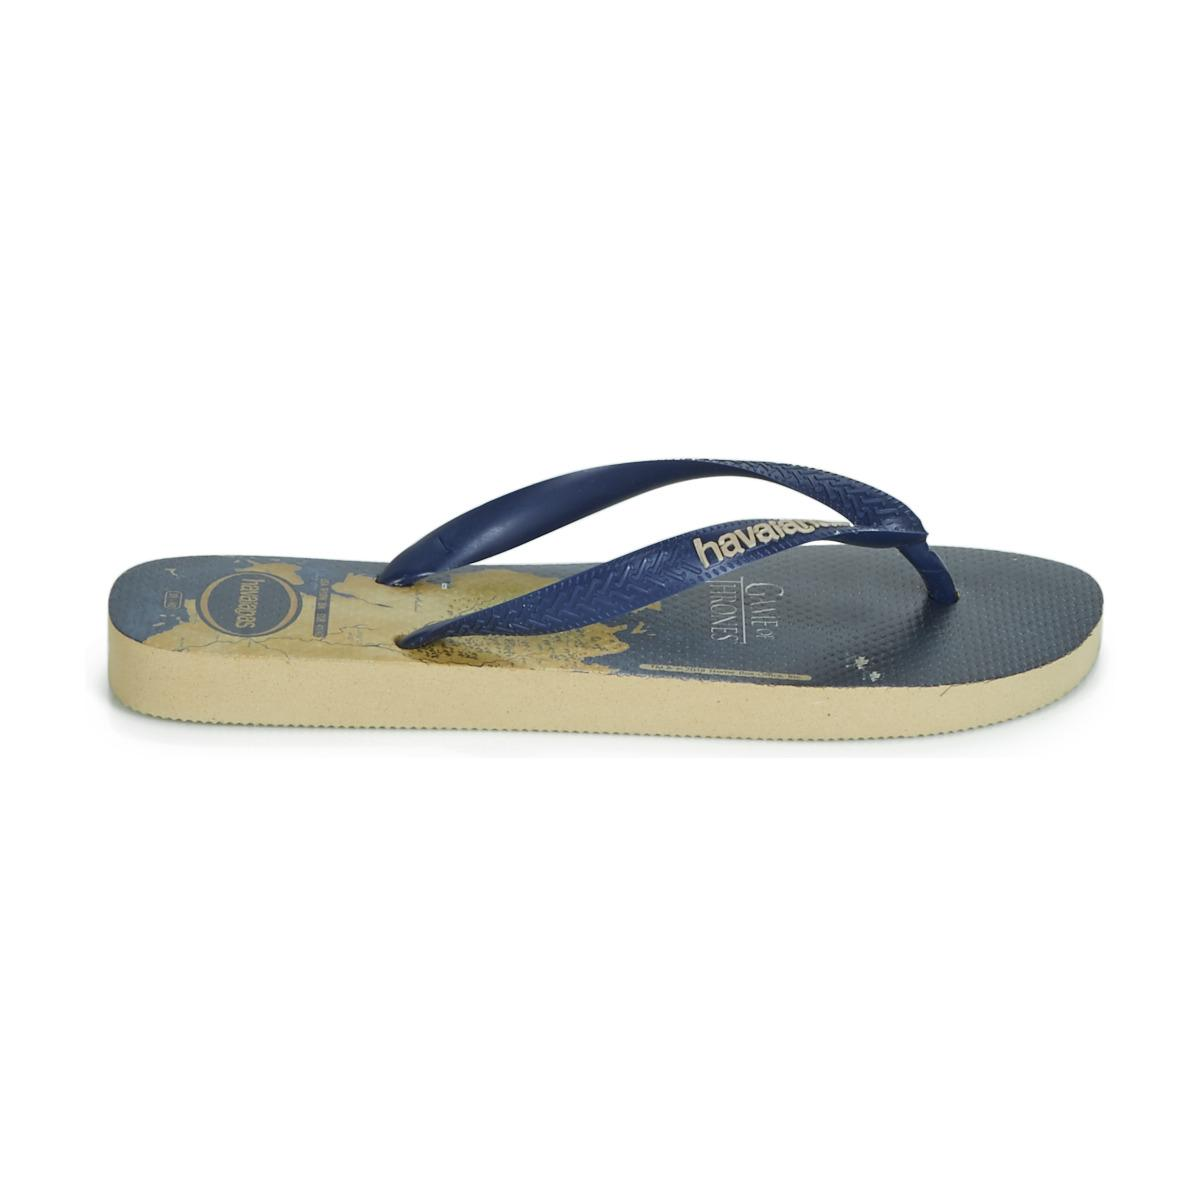 613cf017dbe84 Havaianas - Blue Top Got Flip Flops   Sandals (shoes) for Men - Lyst. View  fullscreen